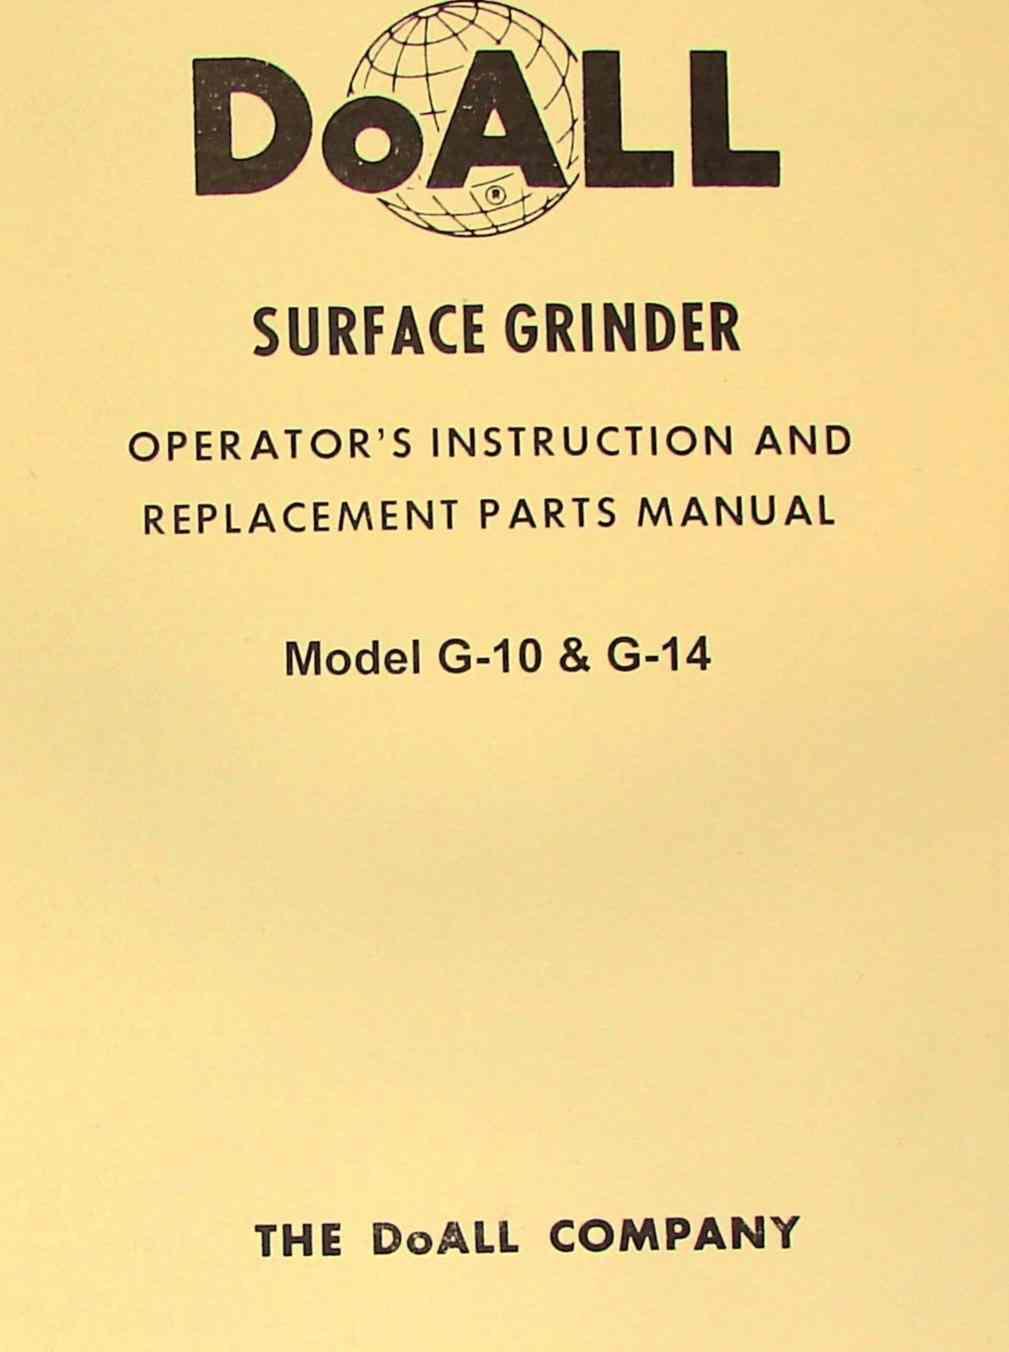 doall g 10 g 14 surface grinder instruction parts manual ozark rh ozarktoolmanuals com Operators Manual Instruction Manual Book